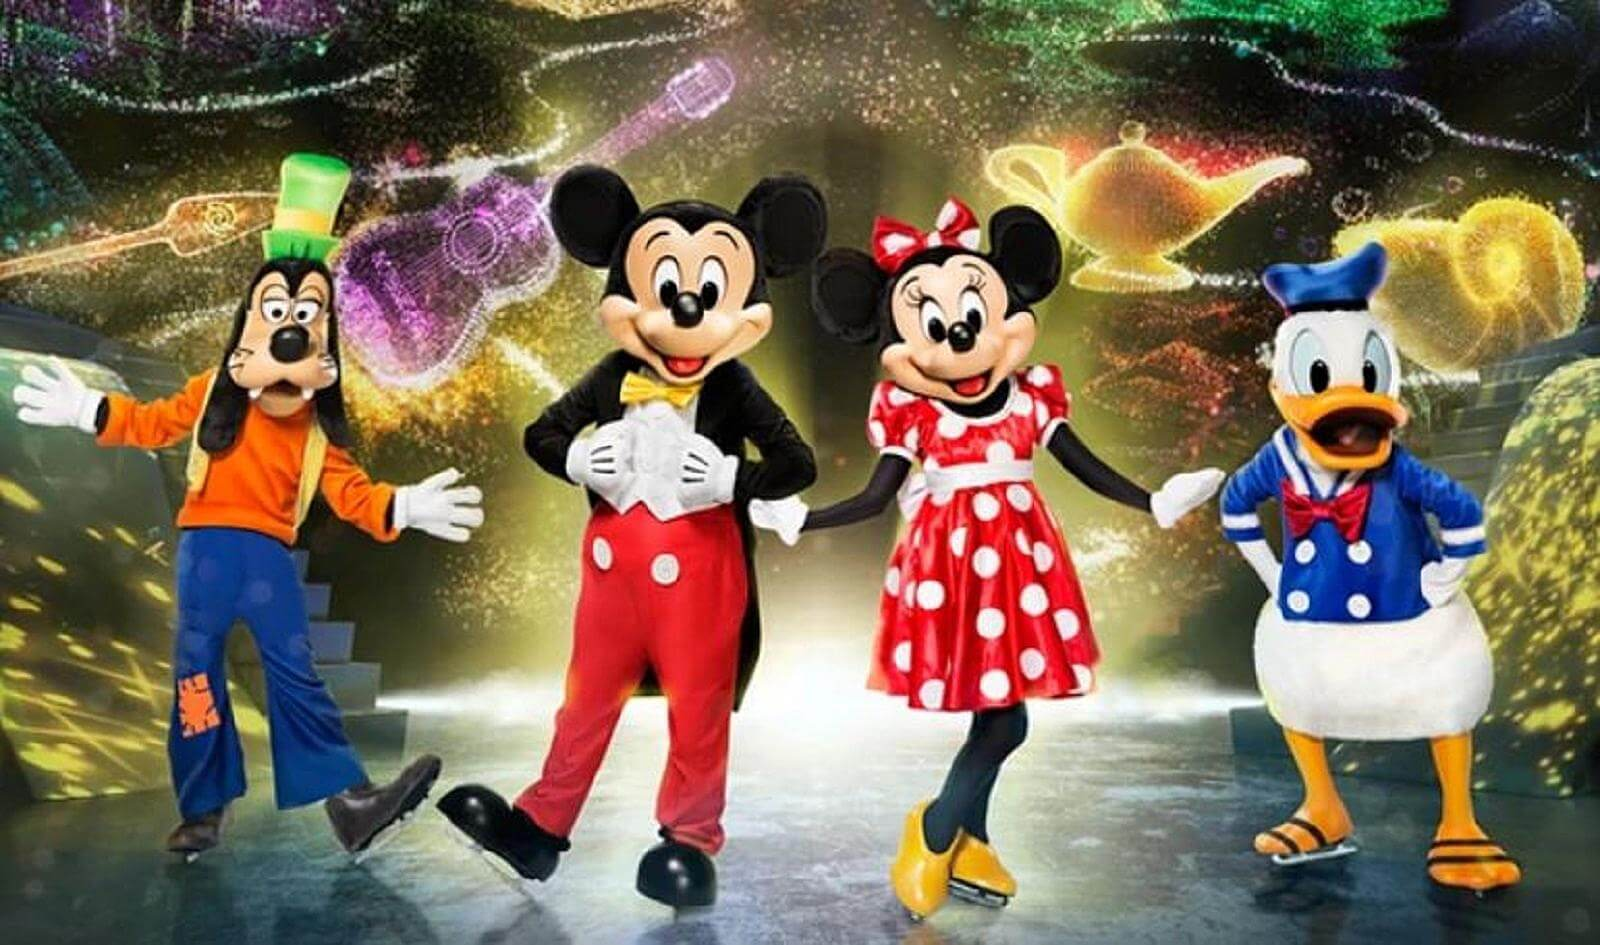 Disney on Ice Presale Code 2021 - (August) Read Now!